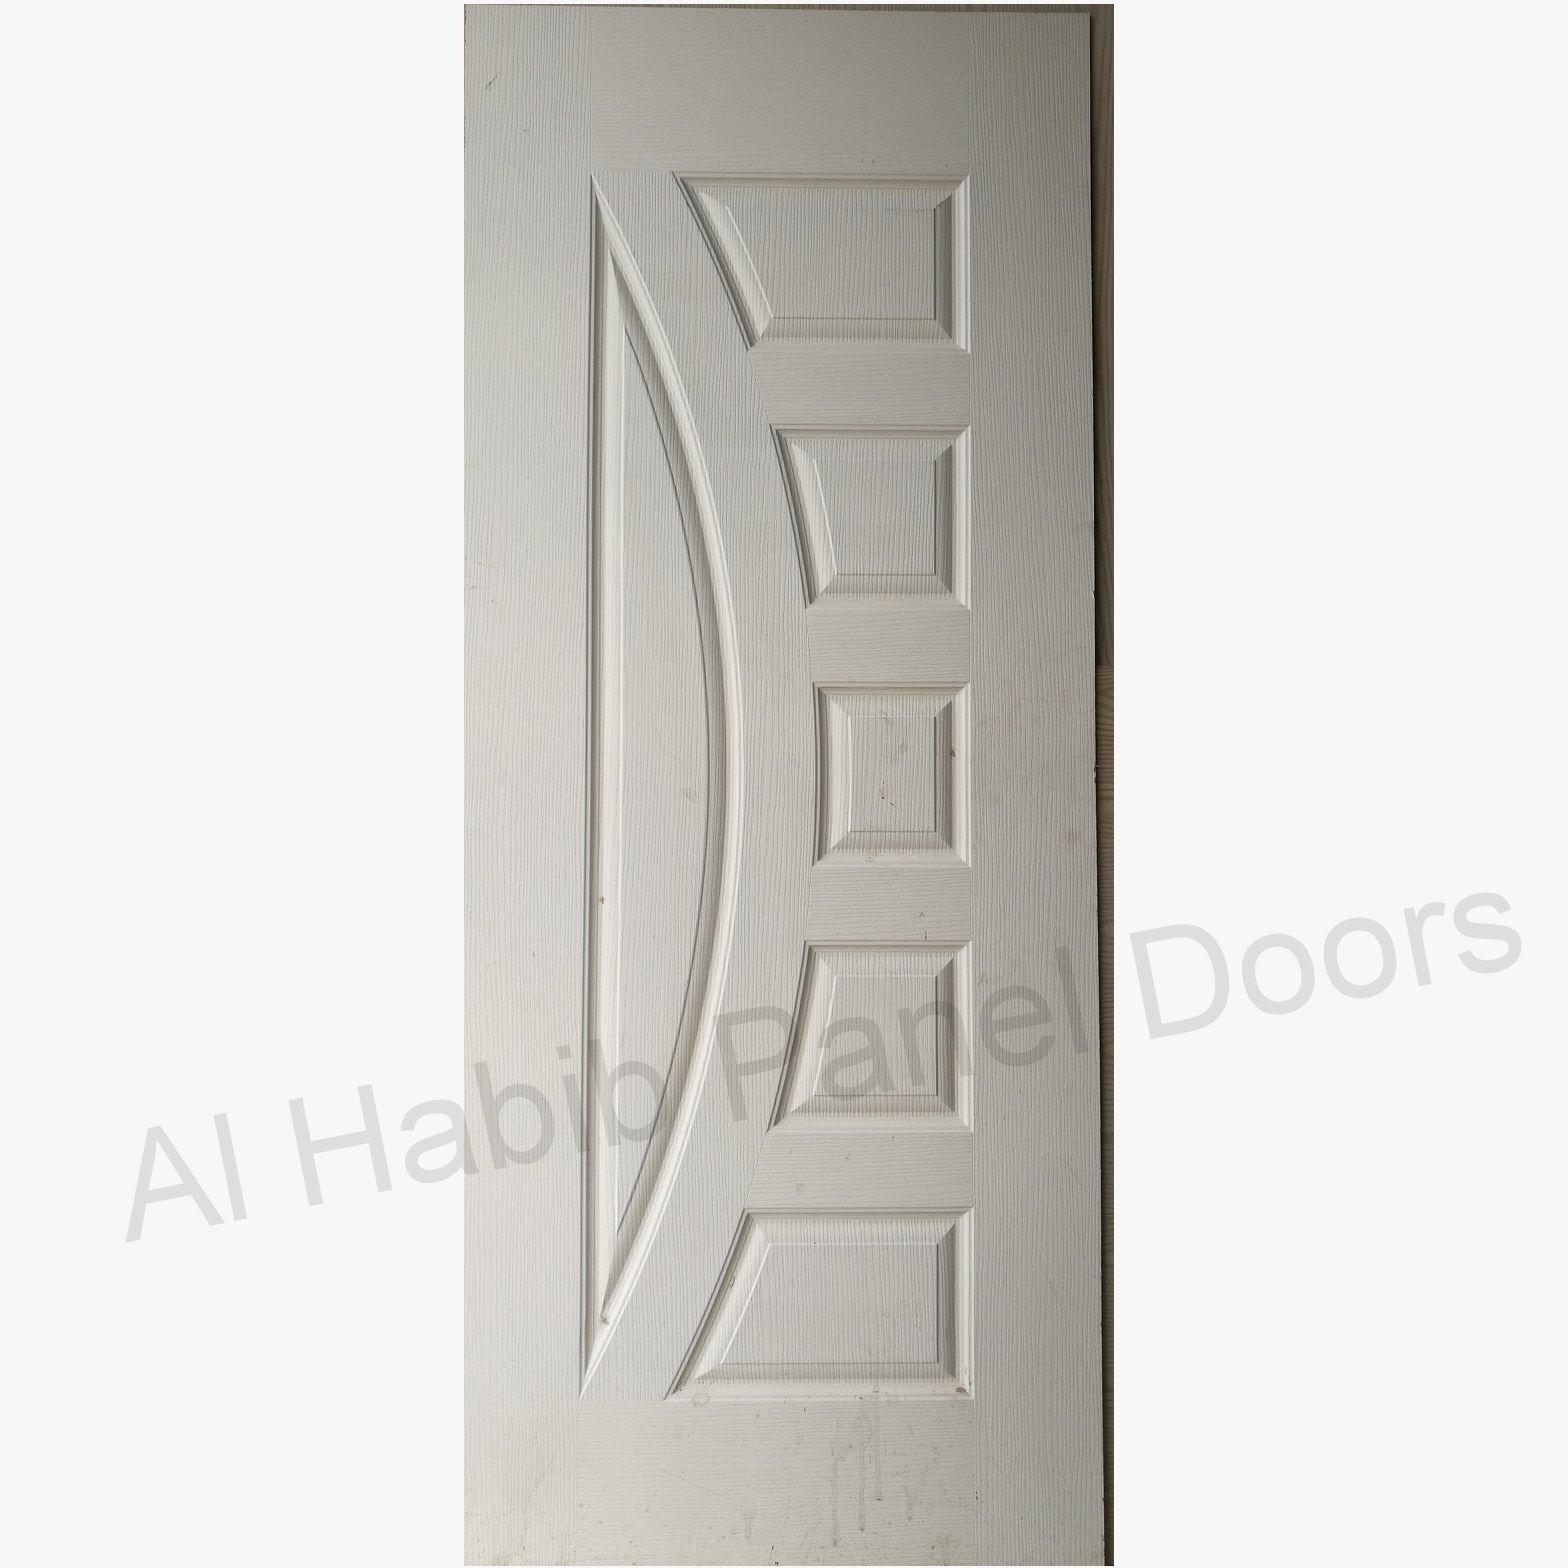 New Malaysian Skin Door Clifton Design Six Panel Hpd566 Panel Skin Doors Al Habib Panel Doors Wood Doors Interior Laminate Doors Panel Doors